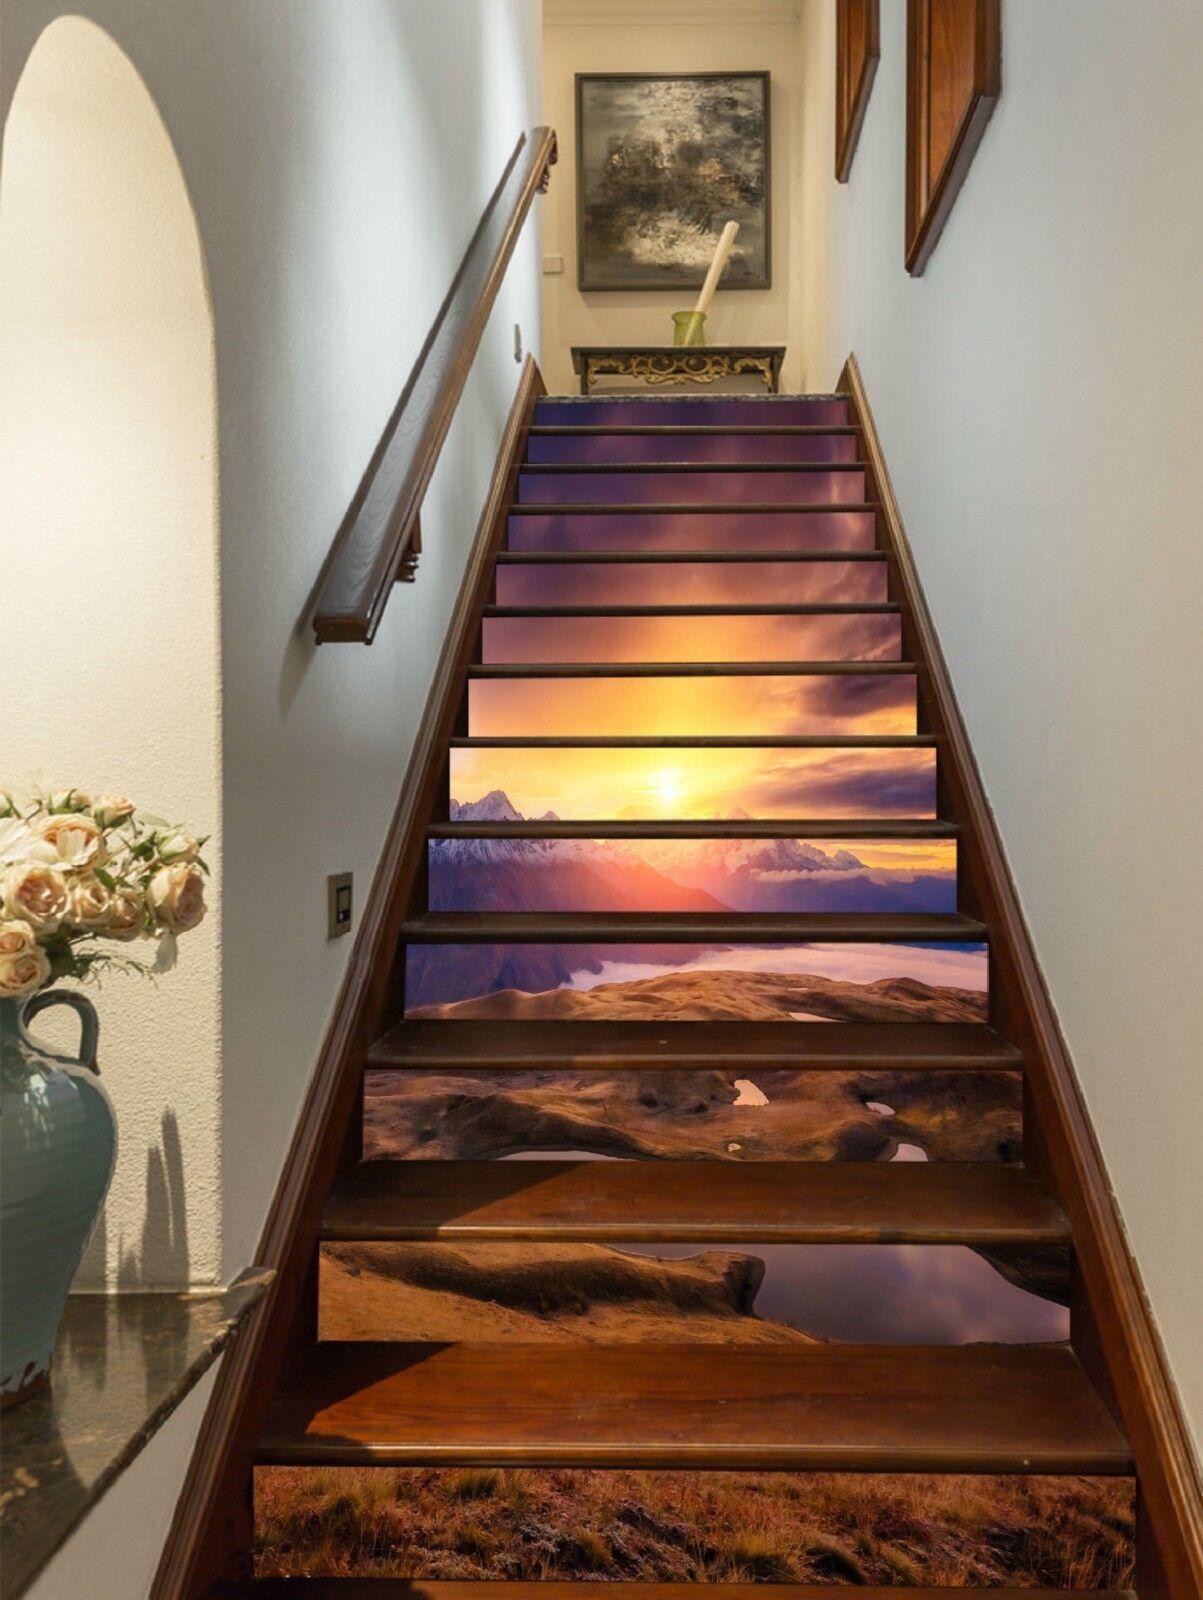 3D Sunset Land Stair Risers Decoration Photo Mural Vinyl Decal WandPapier US